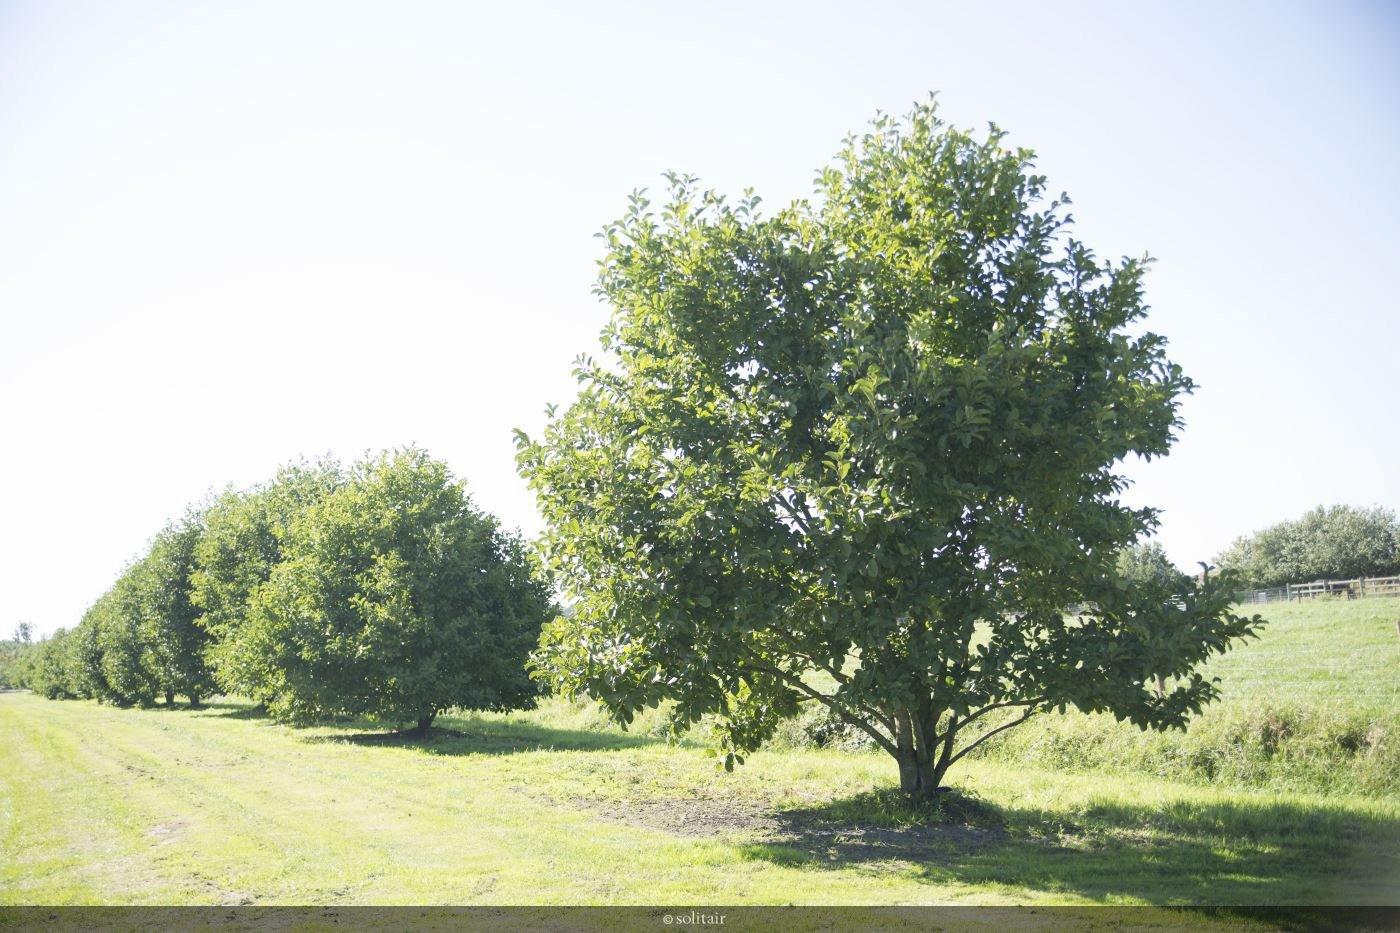 Magnolia loebneri 'Merrill' solitair